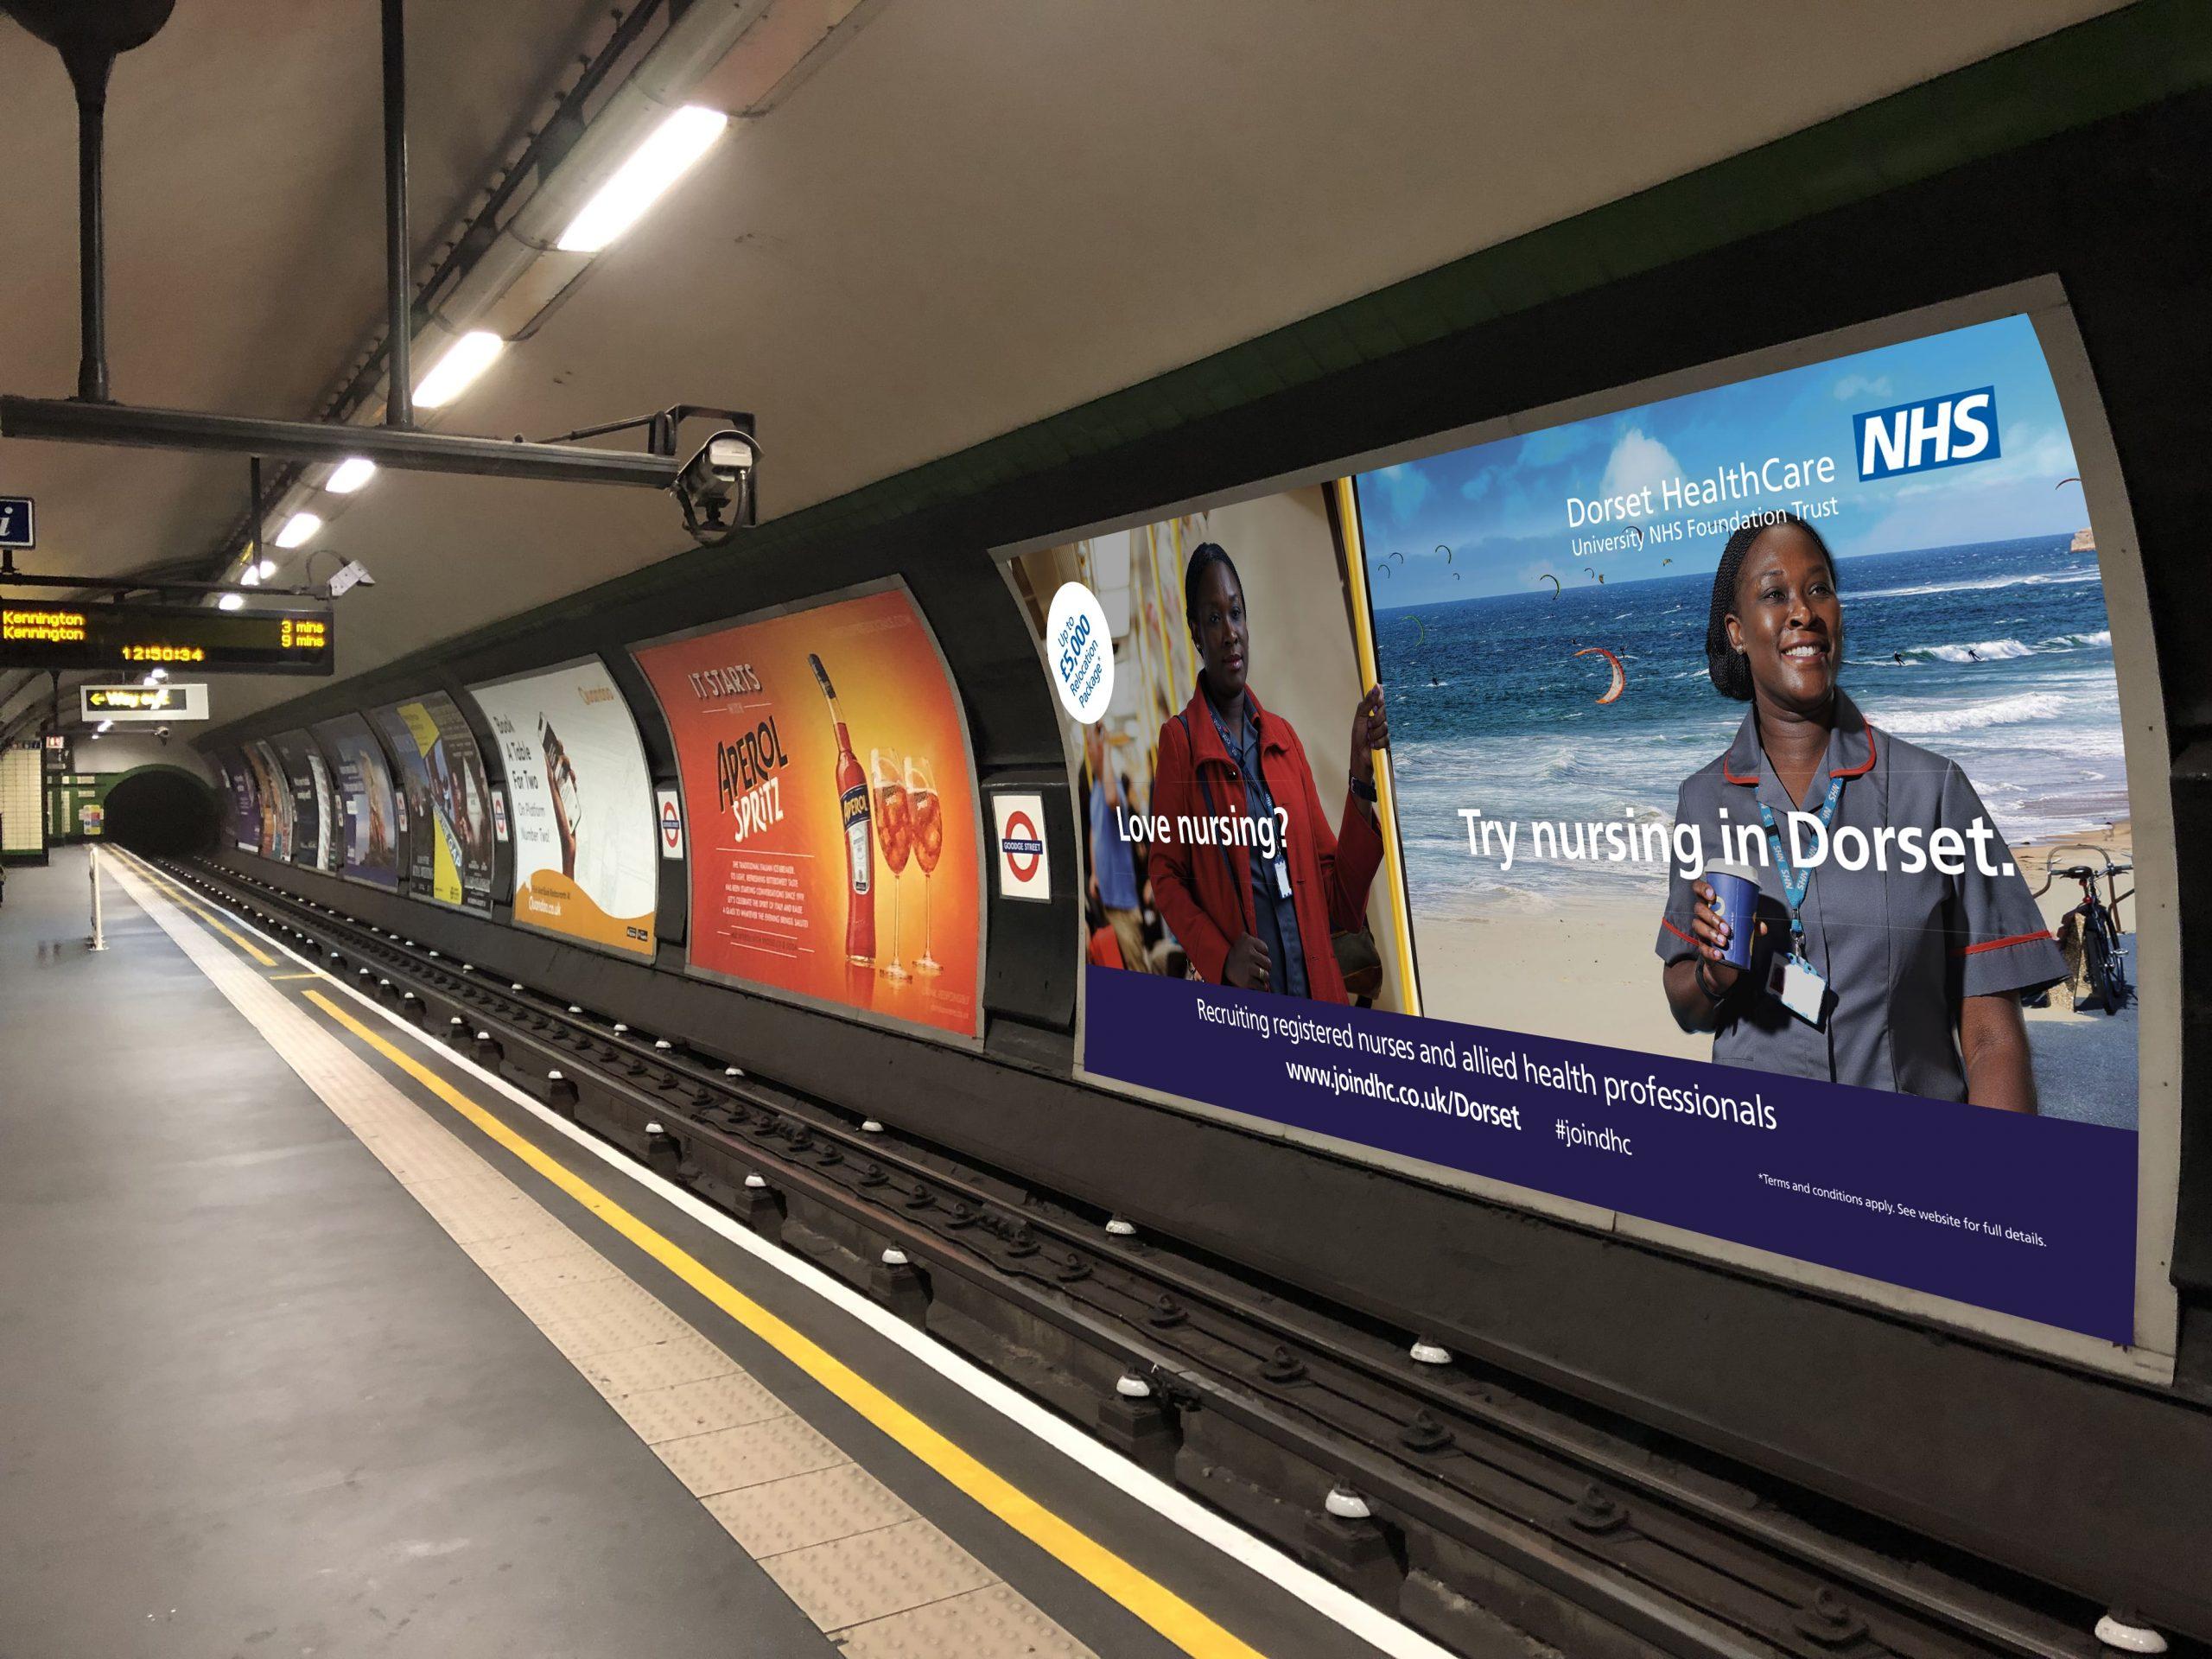 NHS tube station poster images